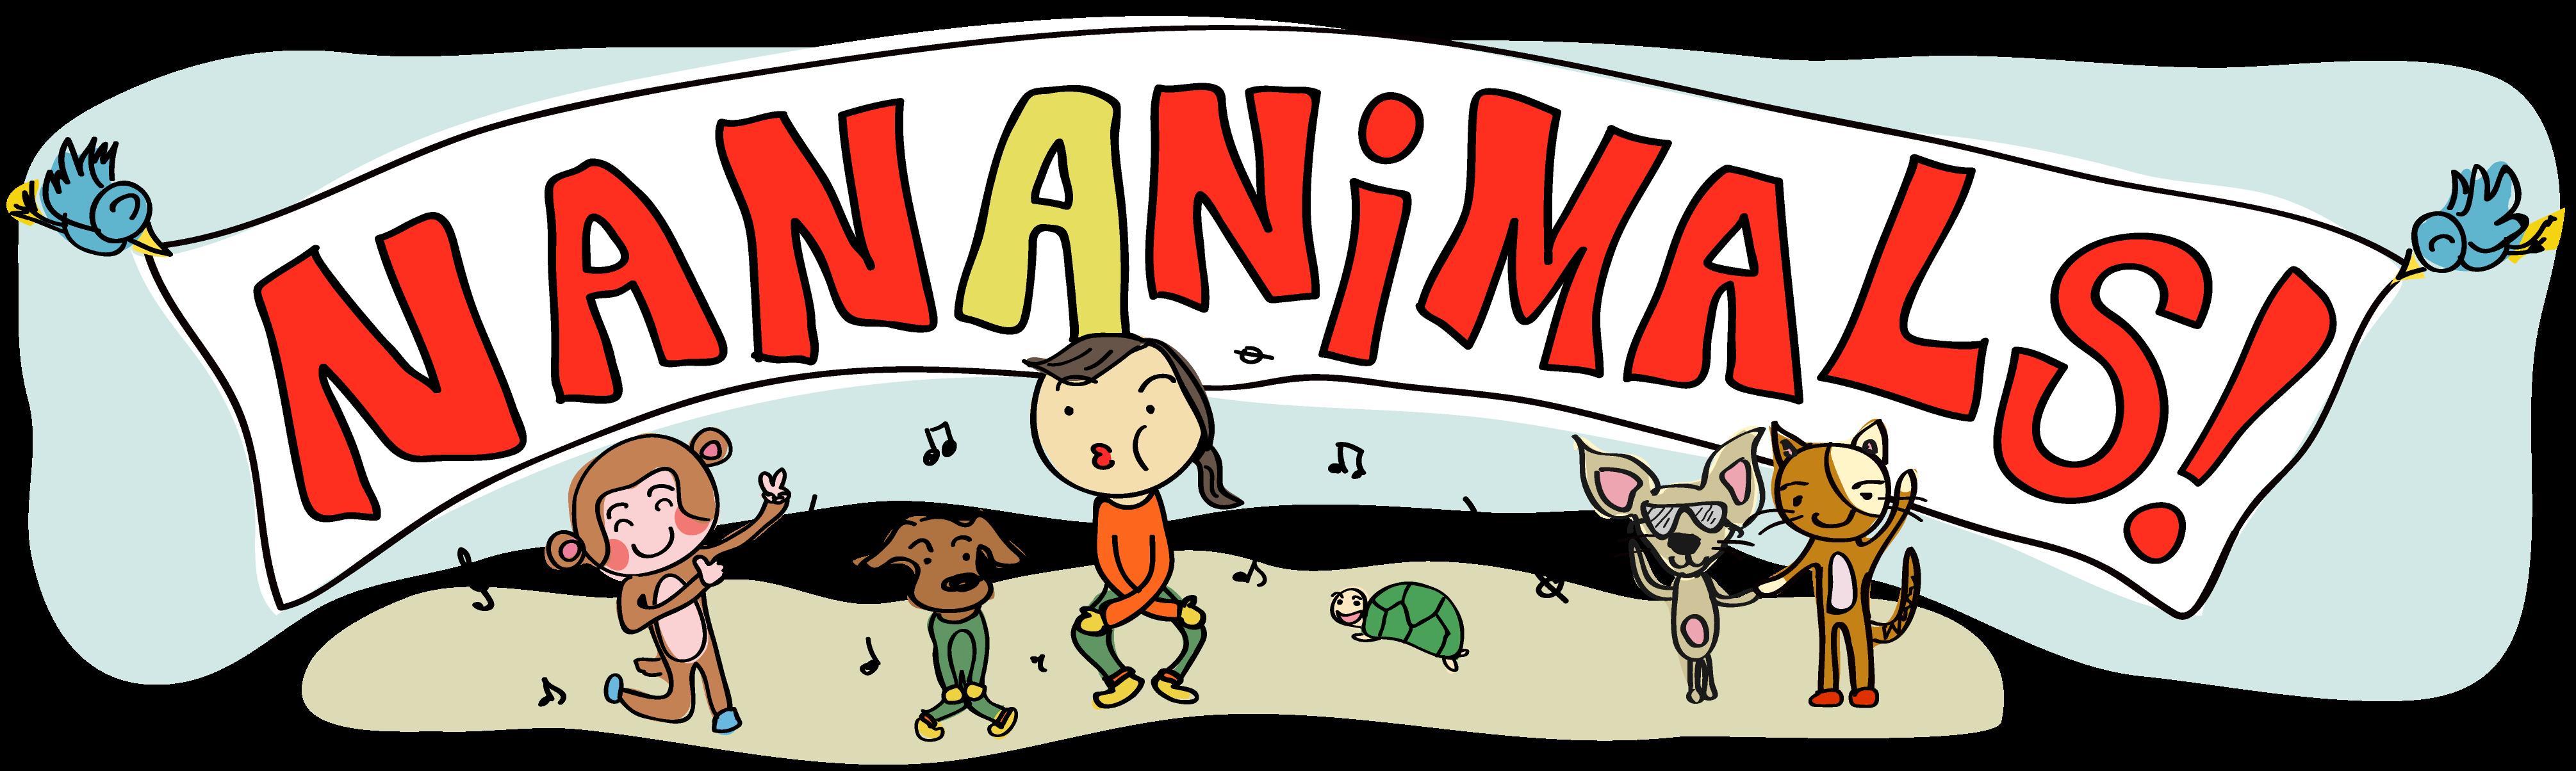 Clipart hippo dancing. Dance love peace nananimals